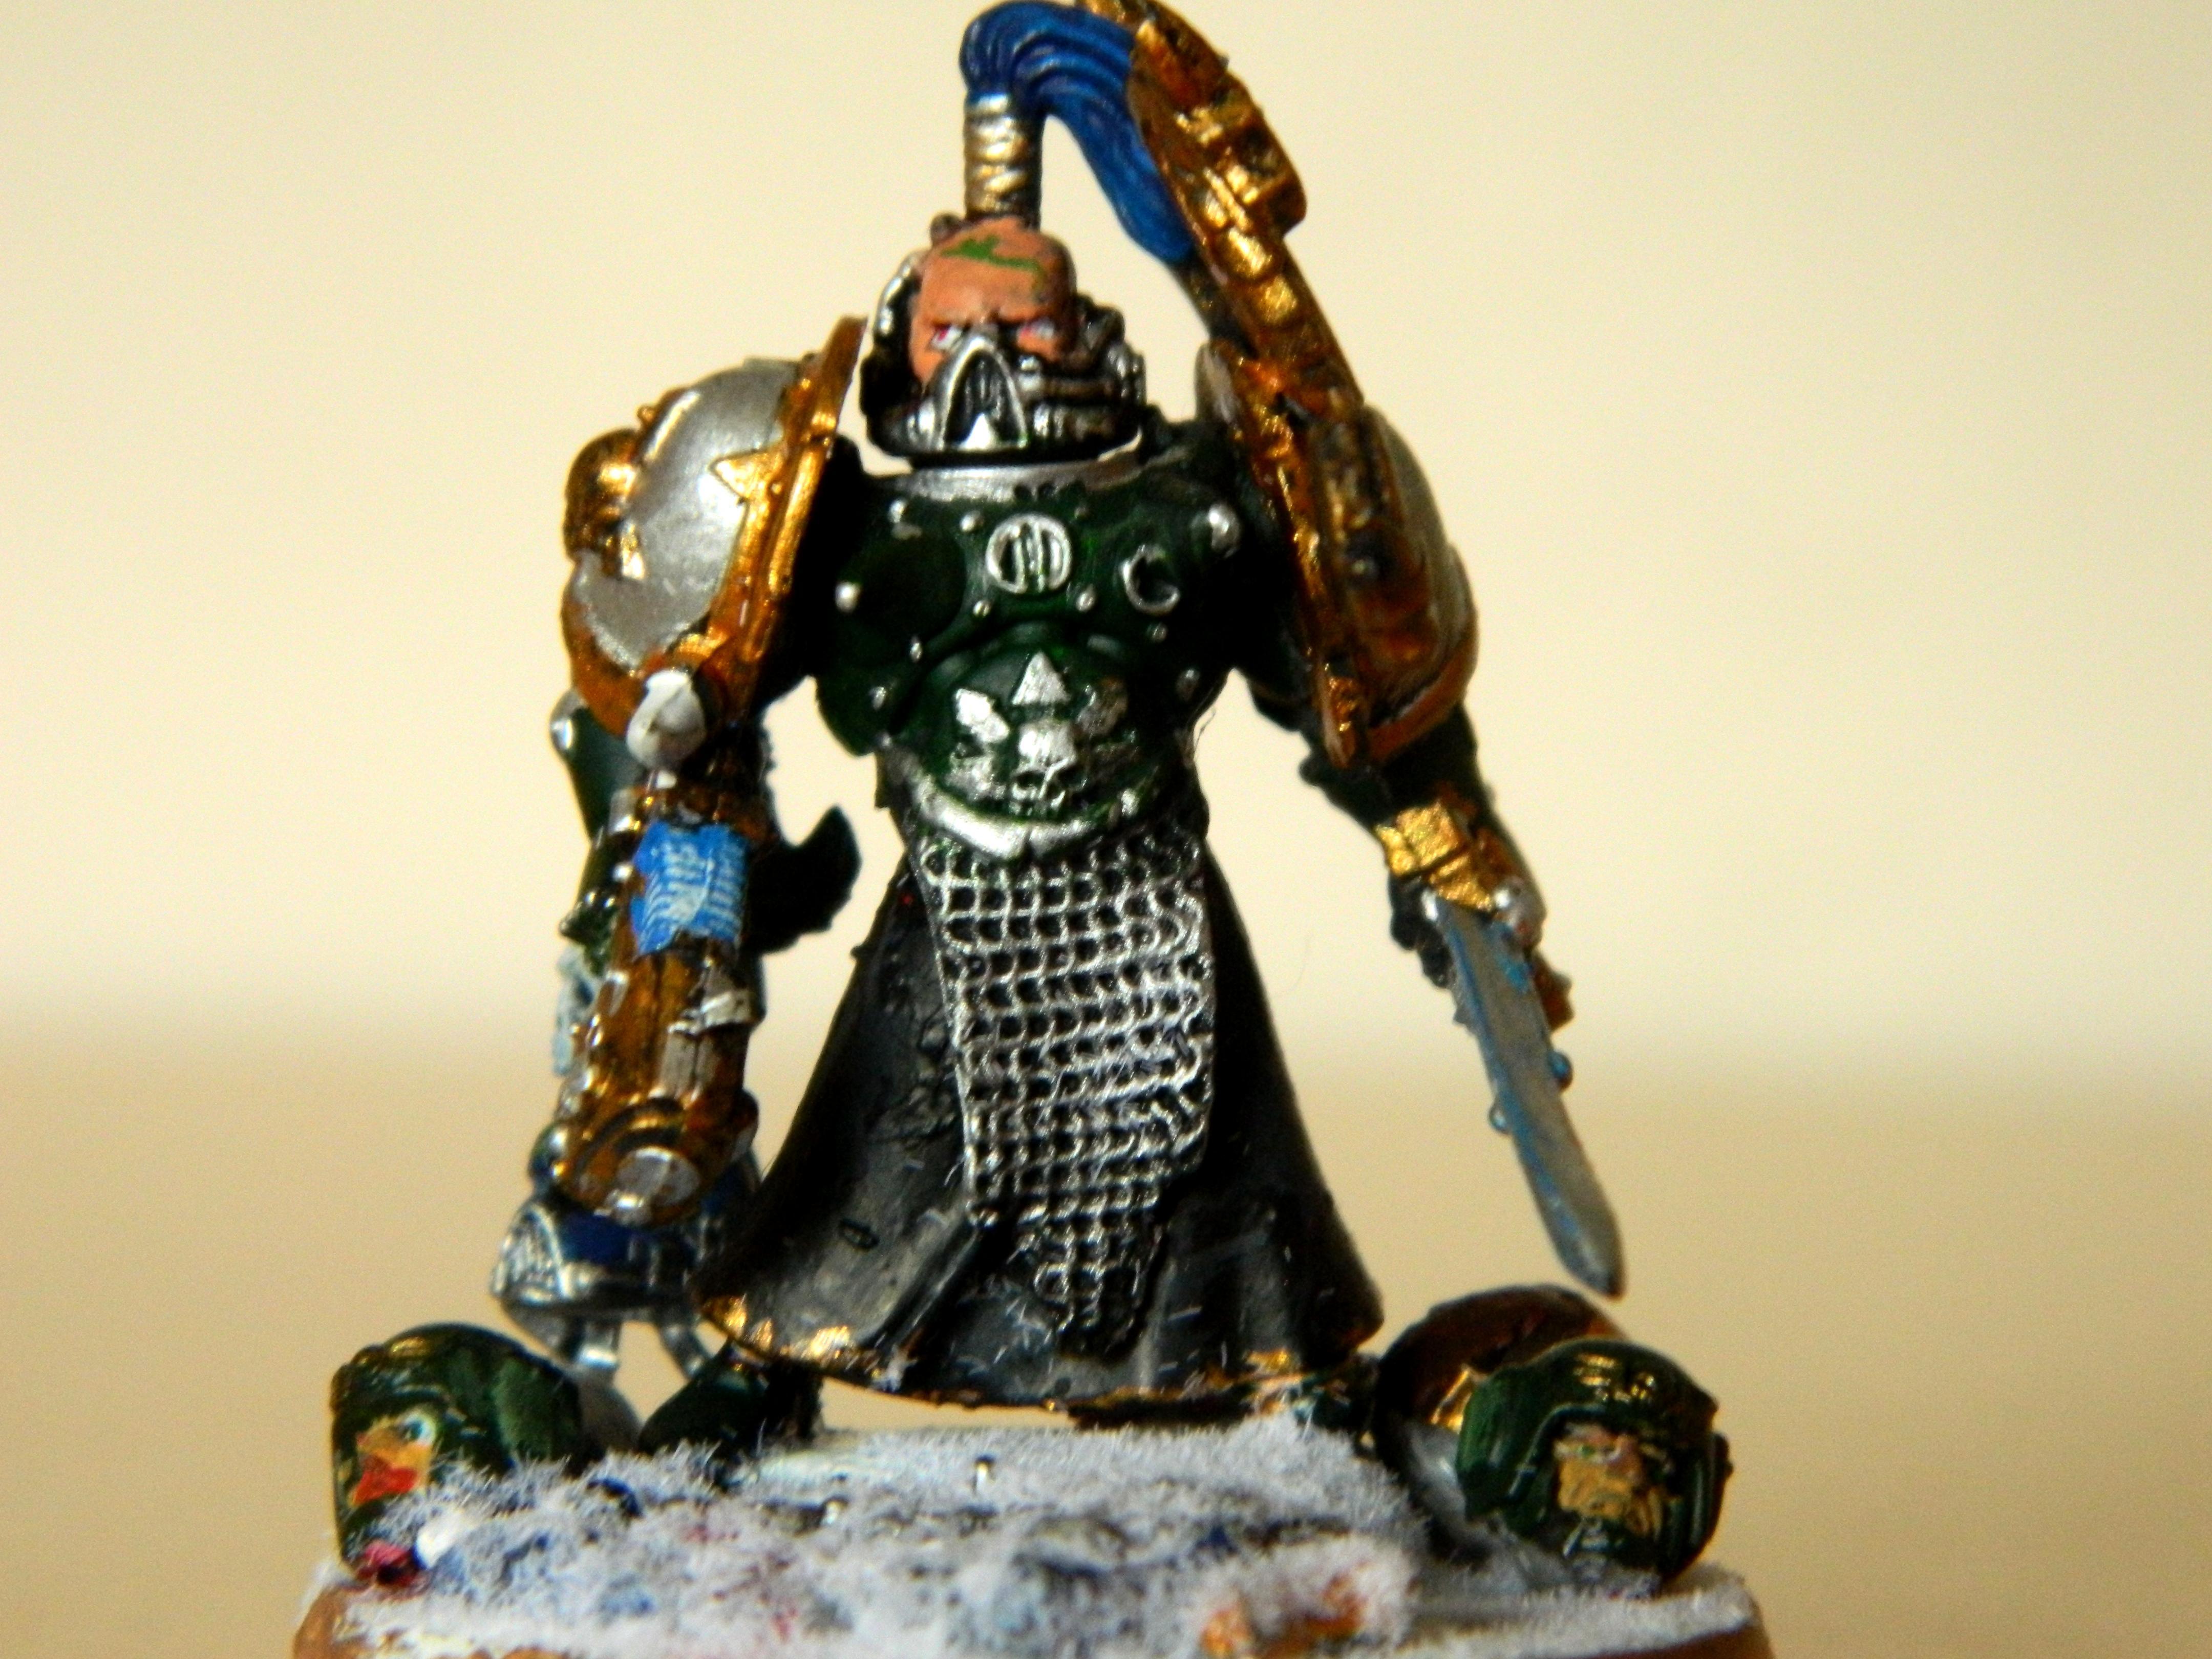 Alpha, Alphalegion, Chaos, Chaos Space Marines, Conversion, Lord, Snow, Warhammer 40,000